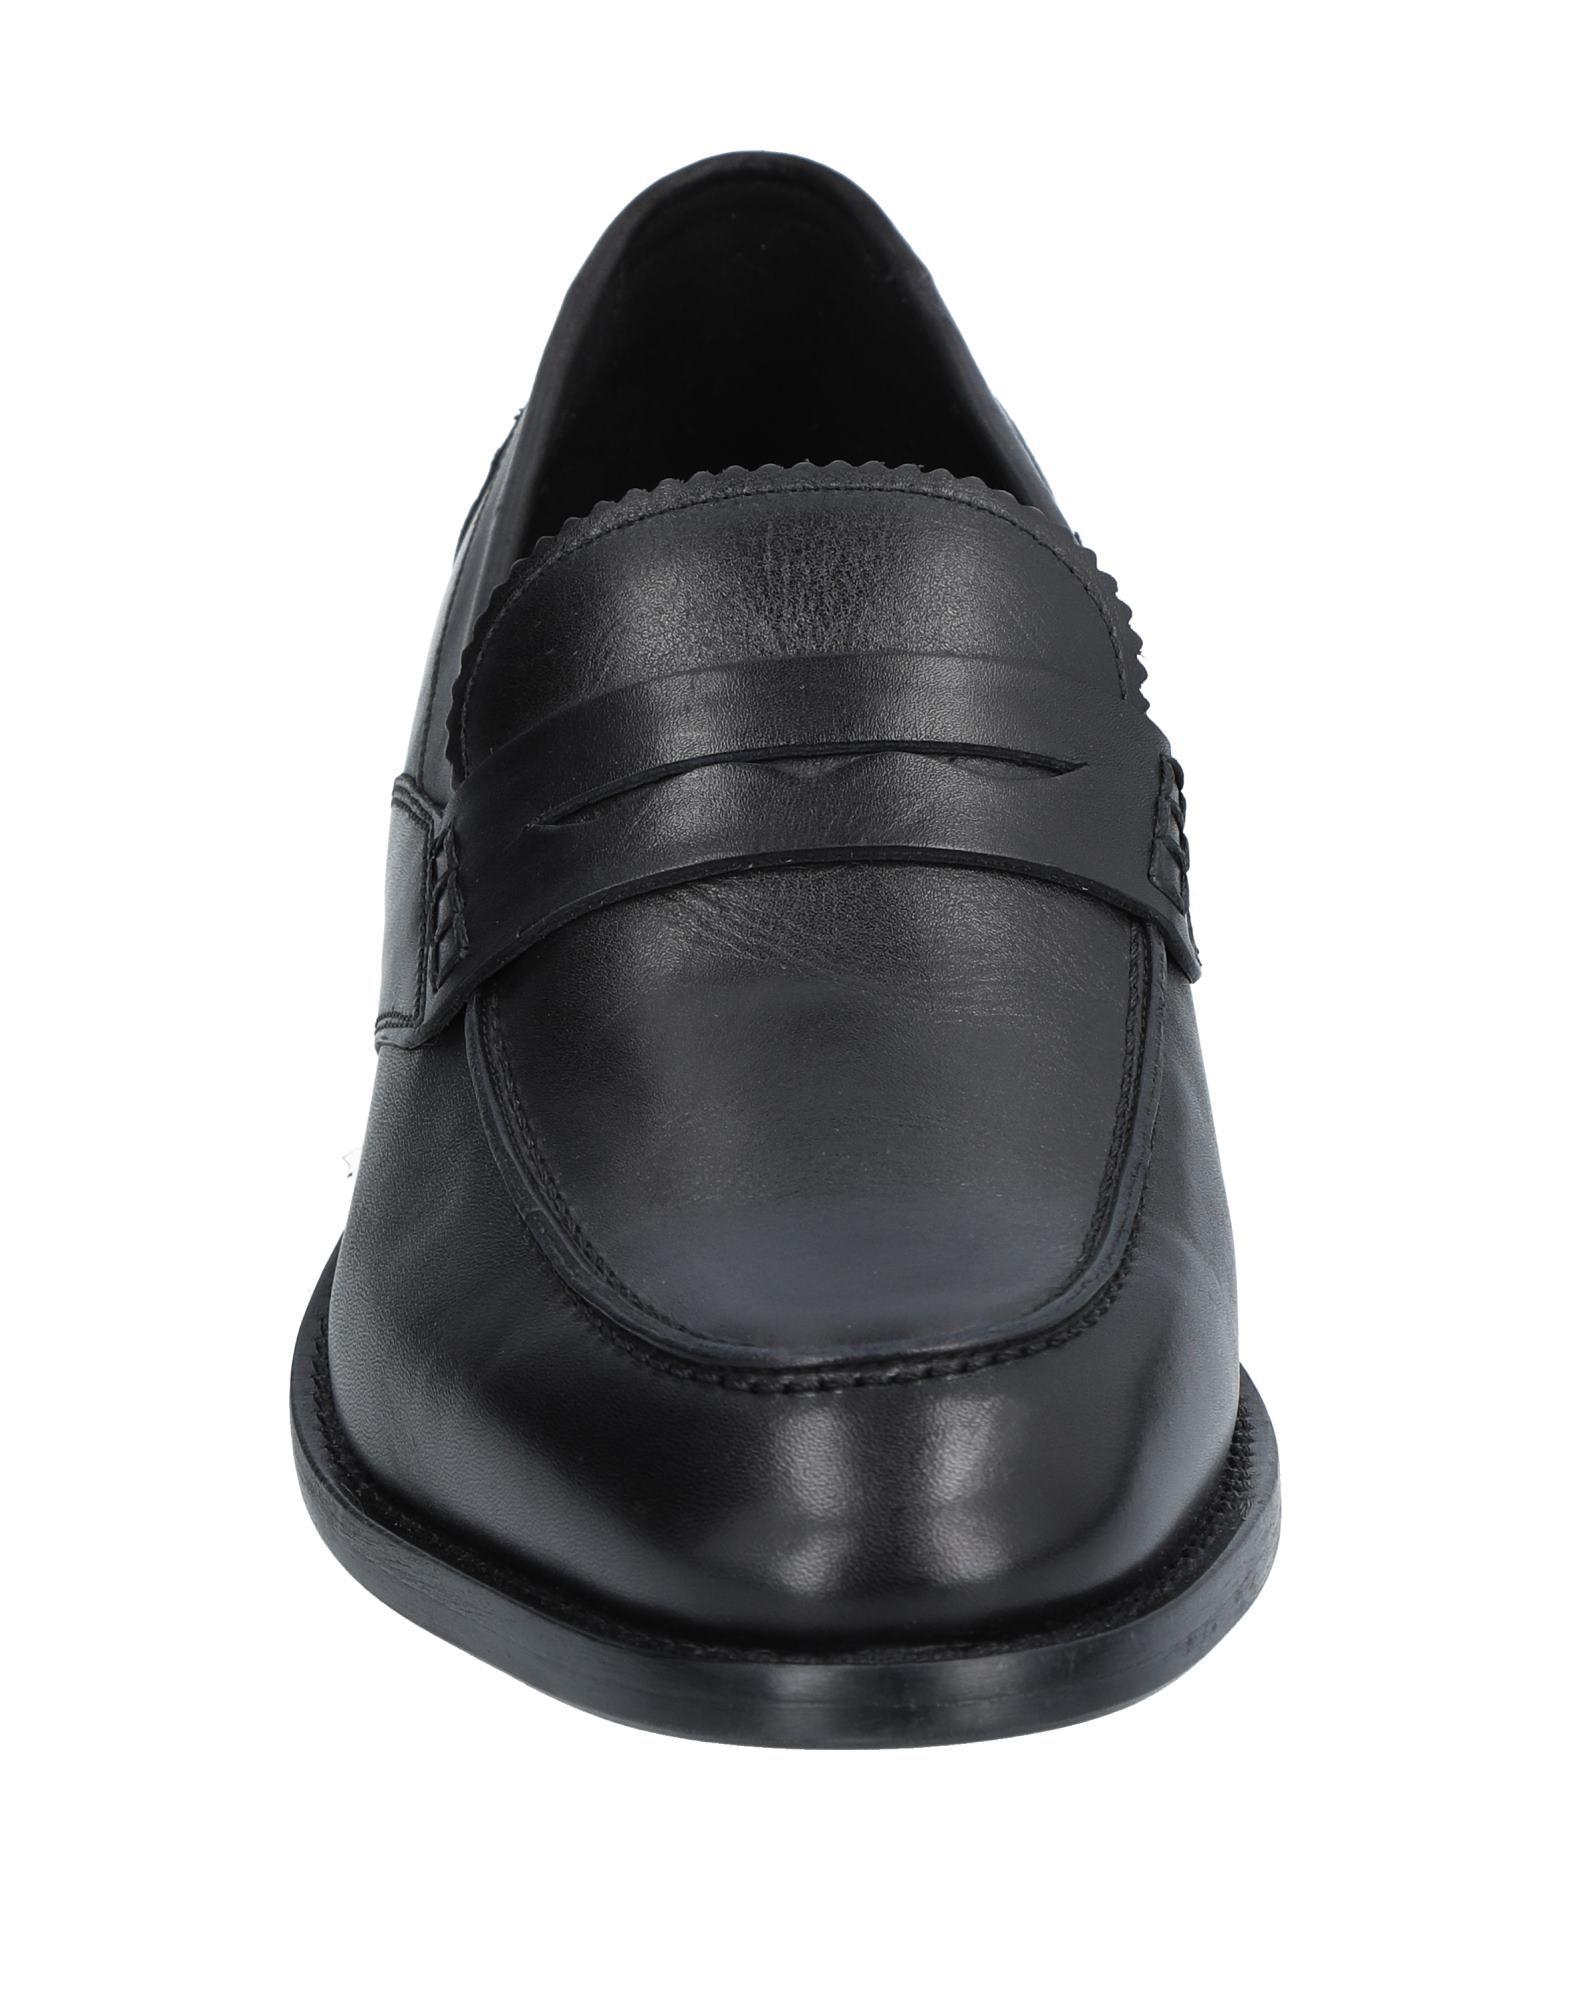 Rabatt echte Schuhe 11540212GM Geox Mokassins Herren  11540212GM Schuhe 874ae9